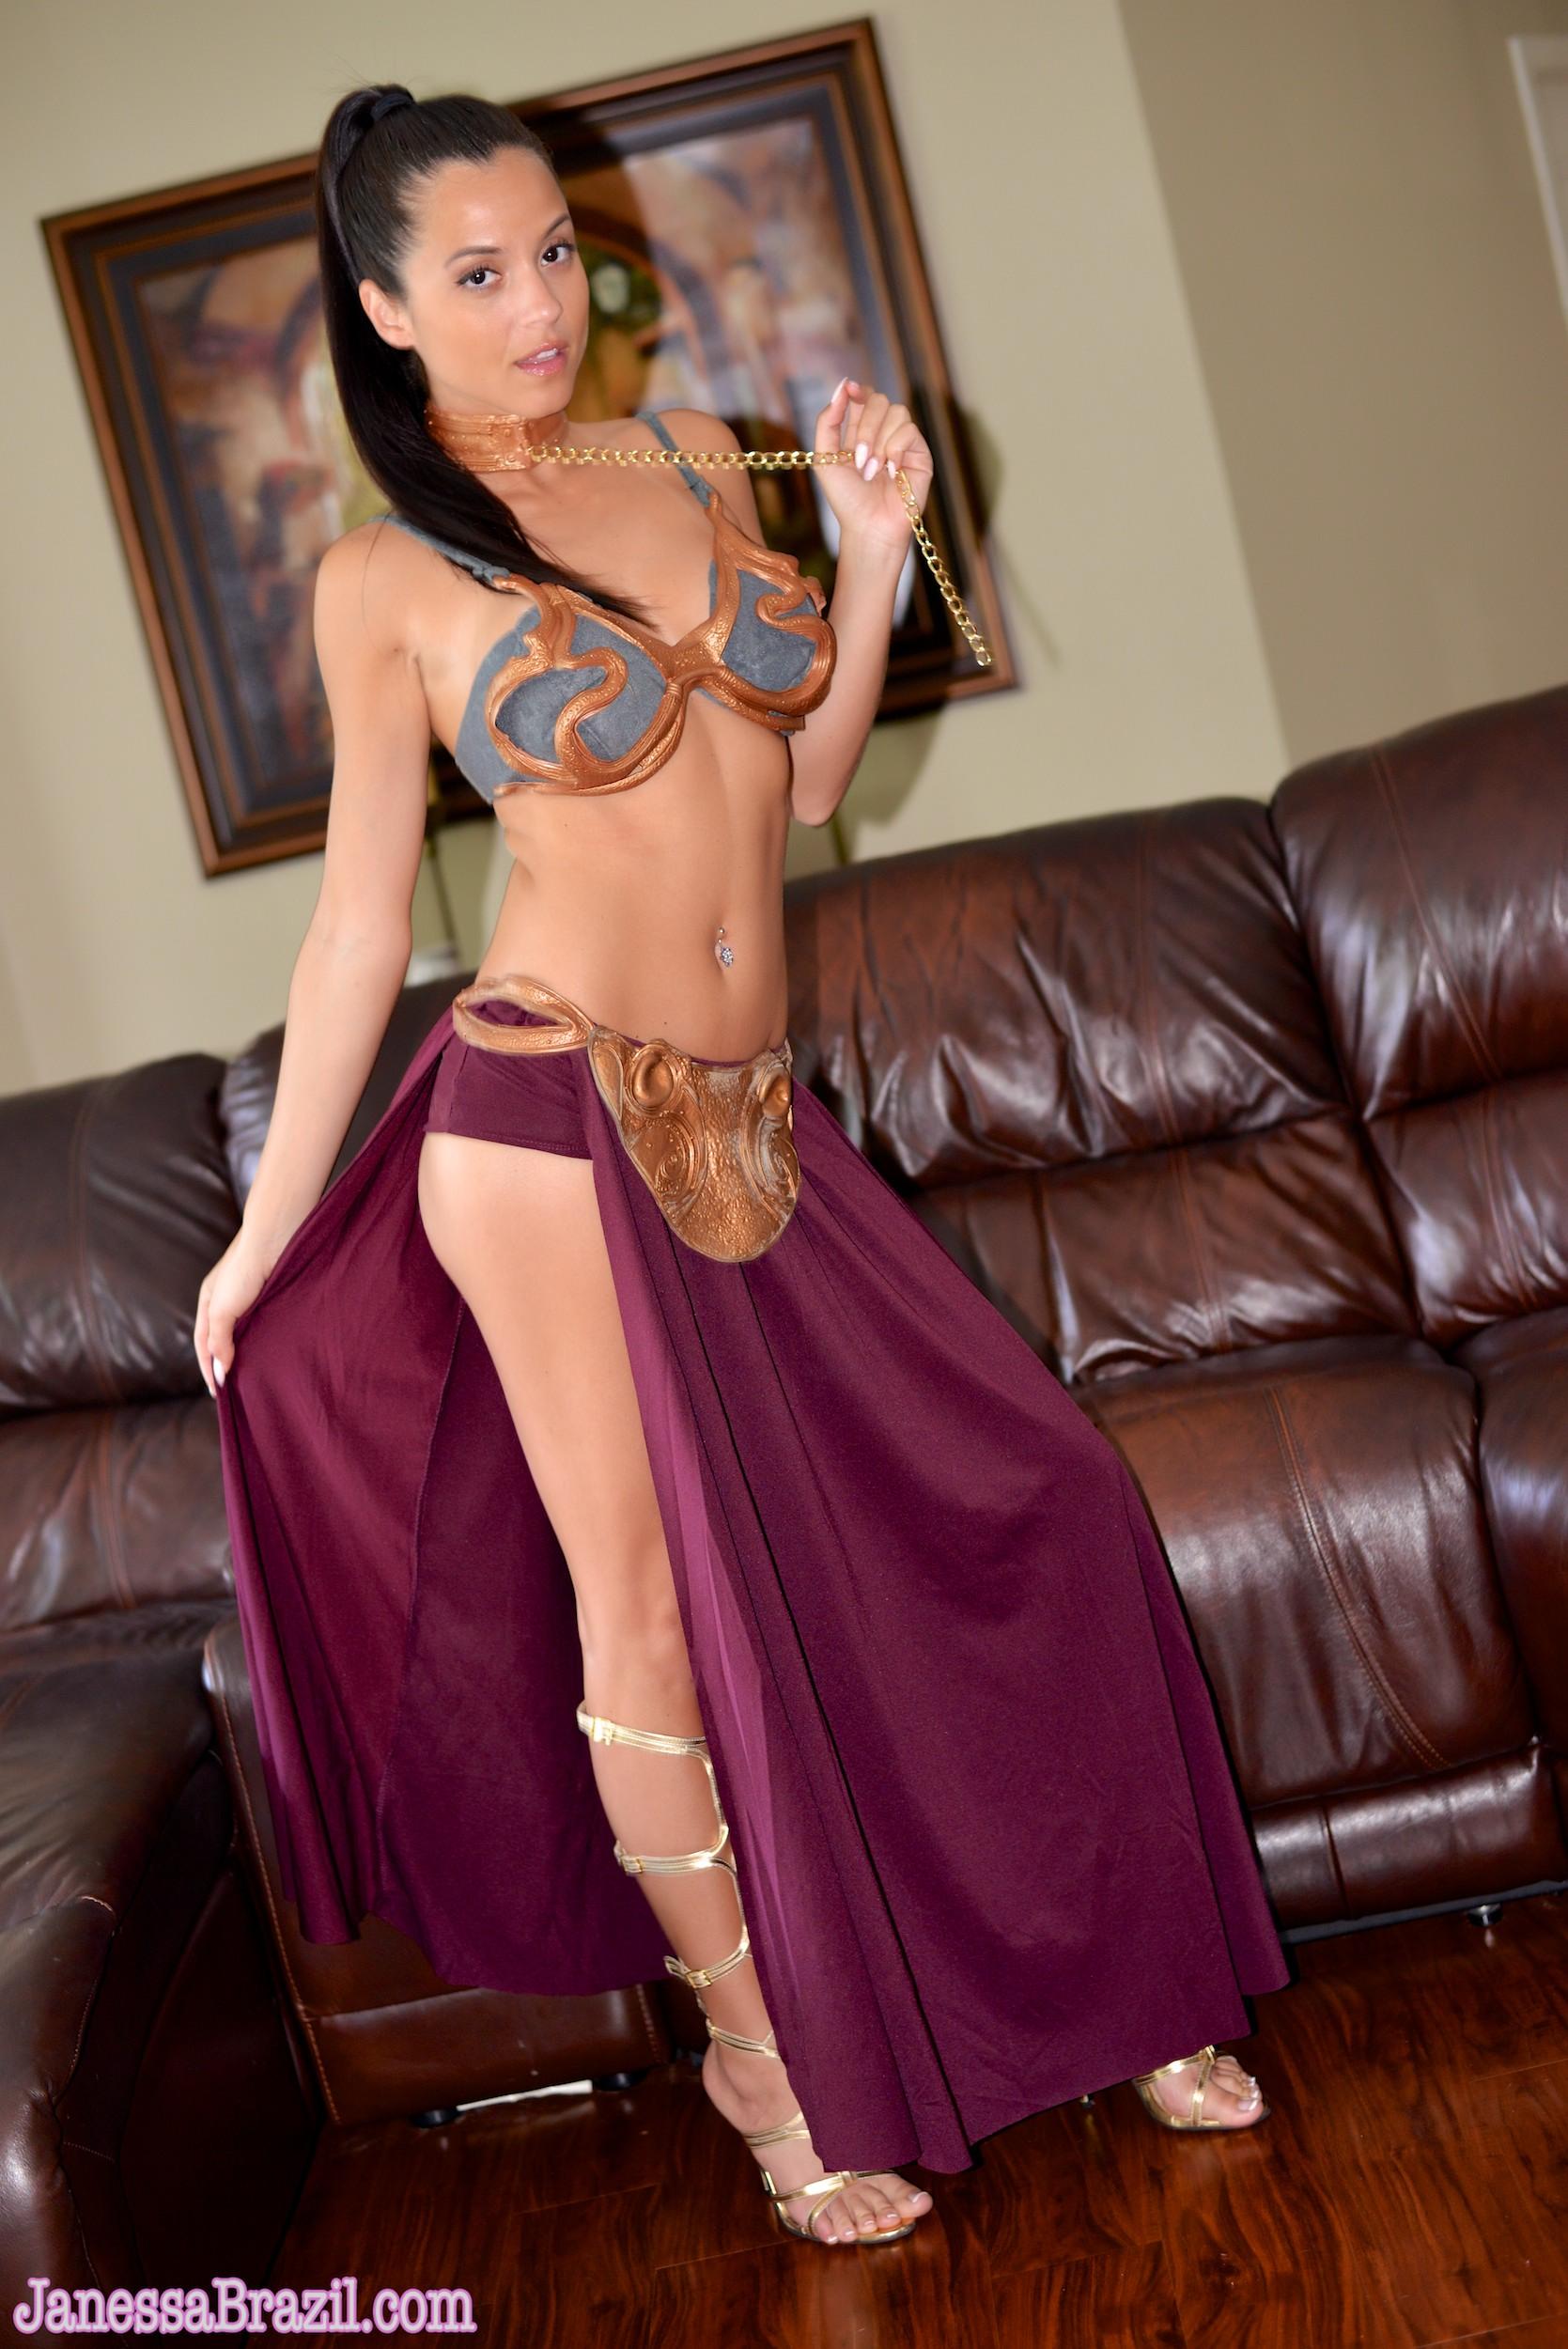 Janessa Brail Cosplay - Slave Leia Metal Bikini Nude 2